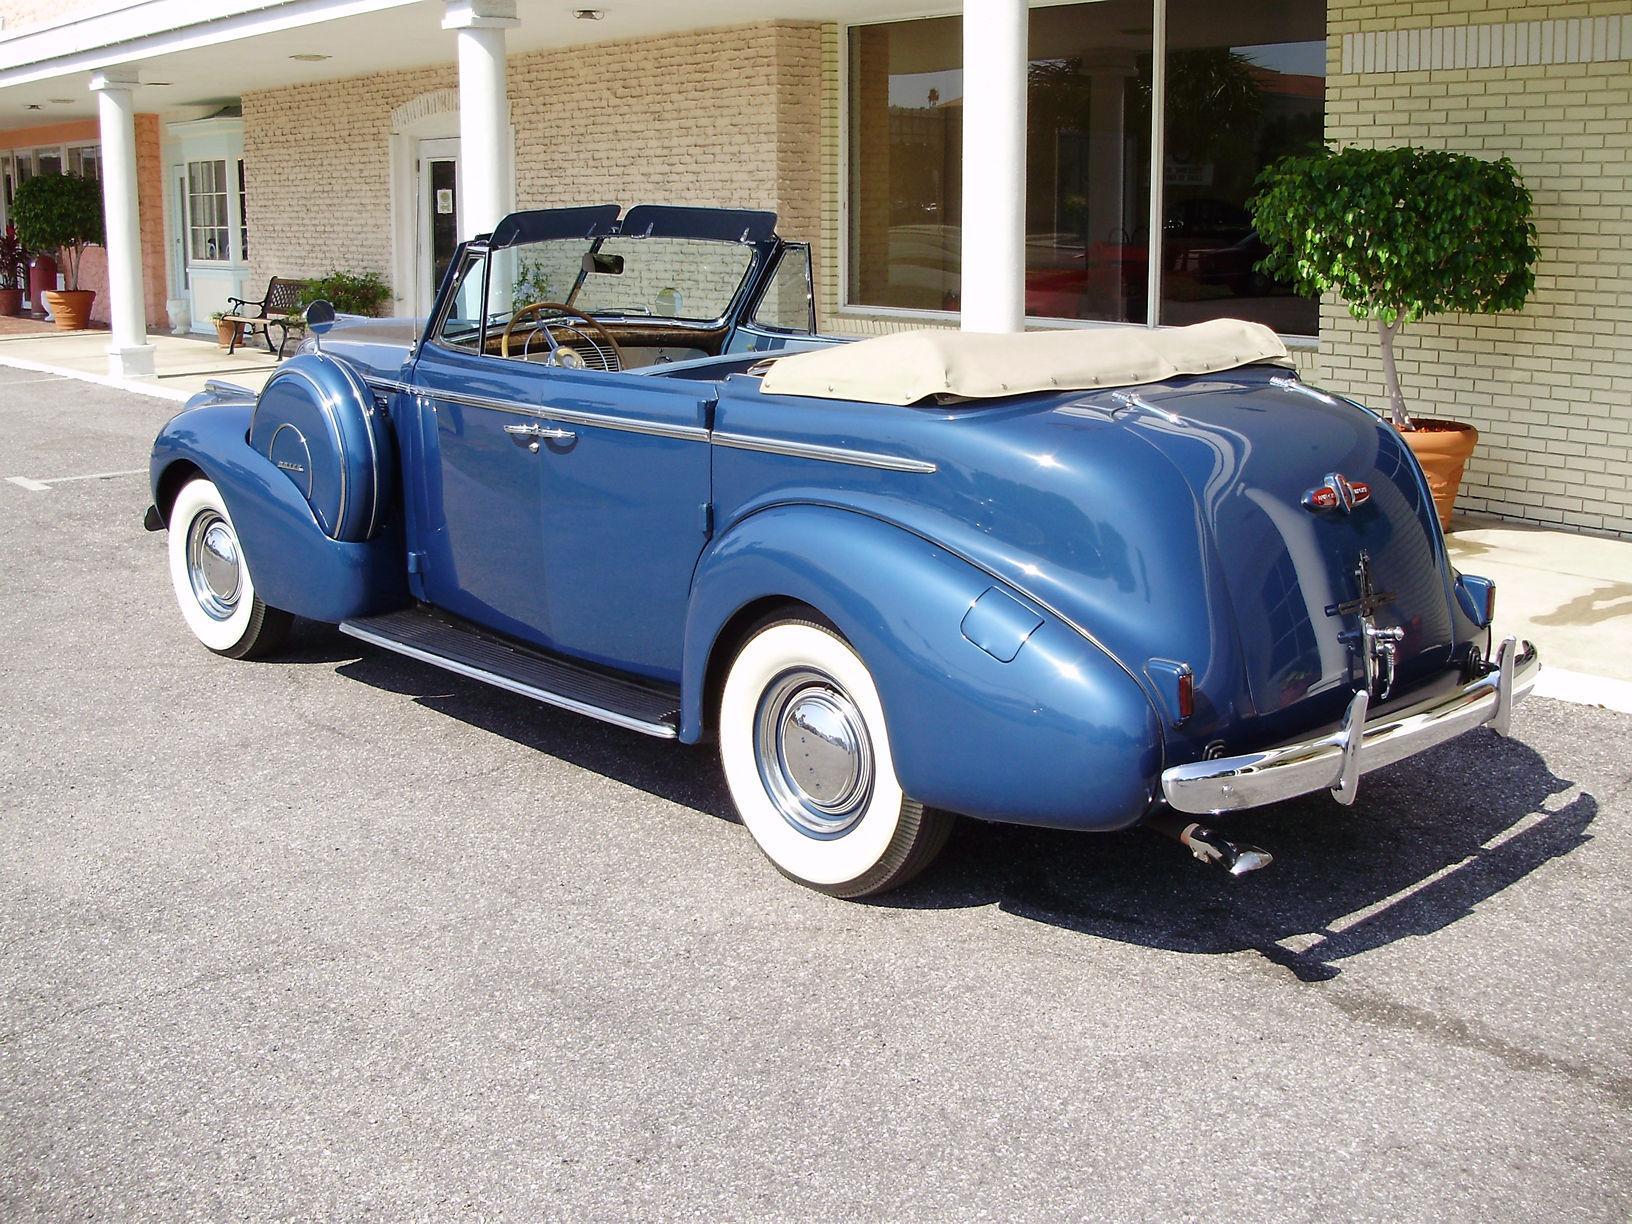 1940 BUICK CENTURY CONVERTIBLE SEDAN - Vintage Motors of Sarasota Inc. #4